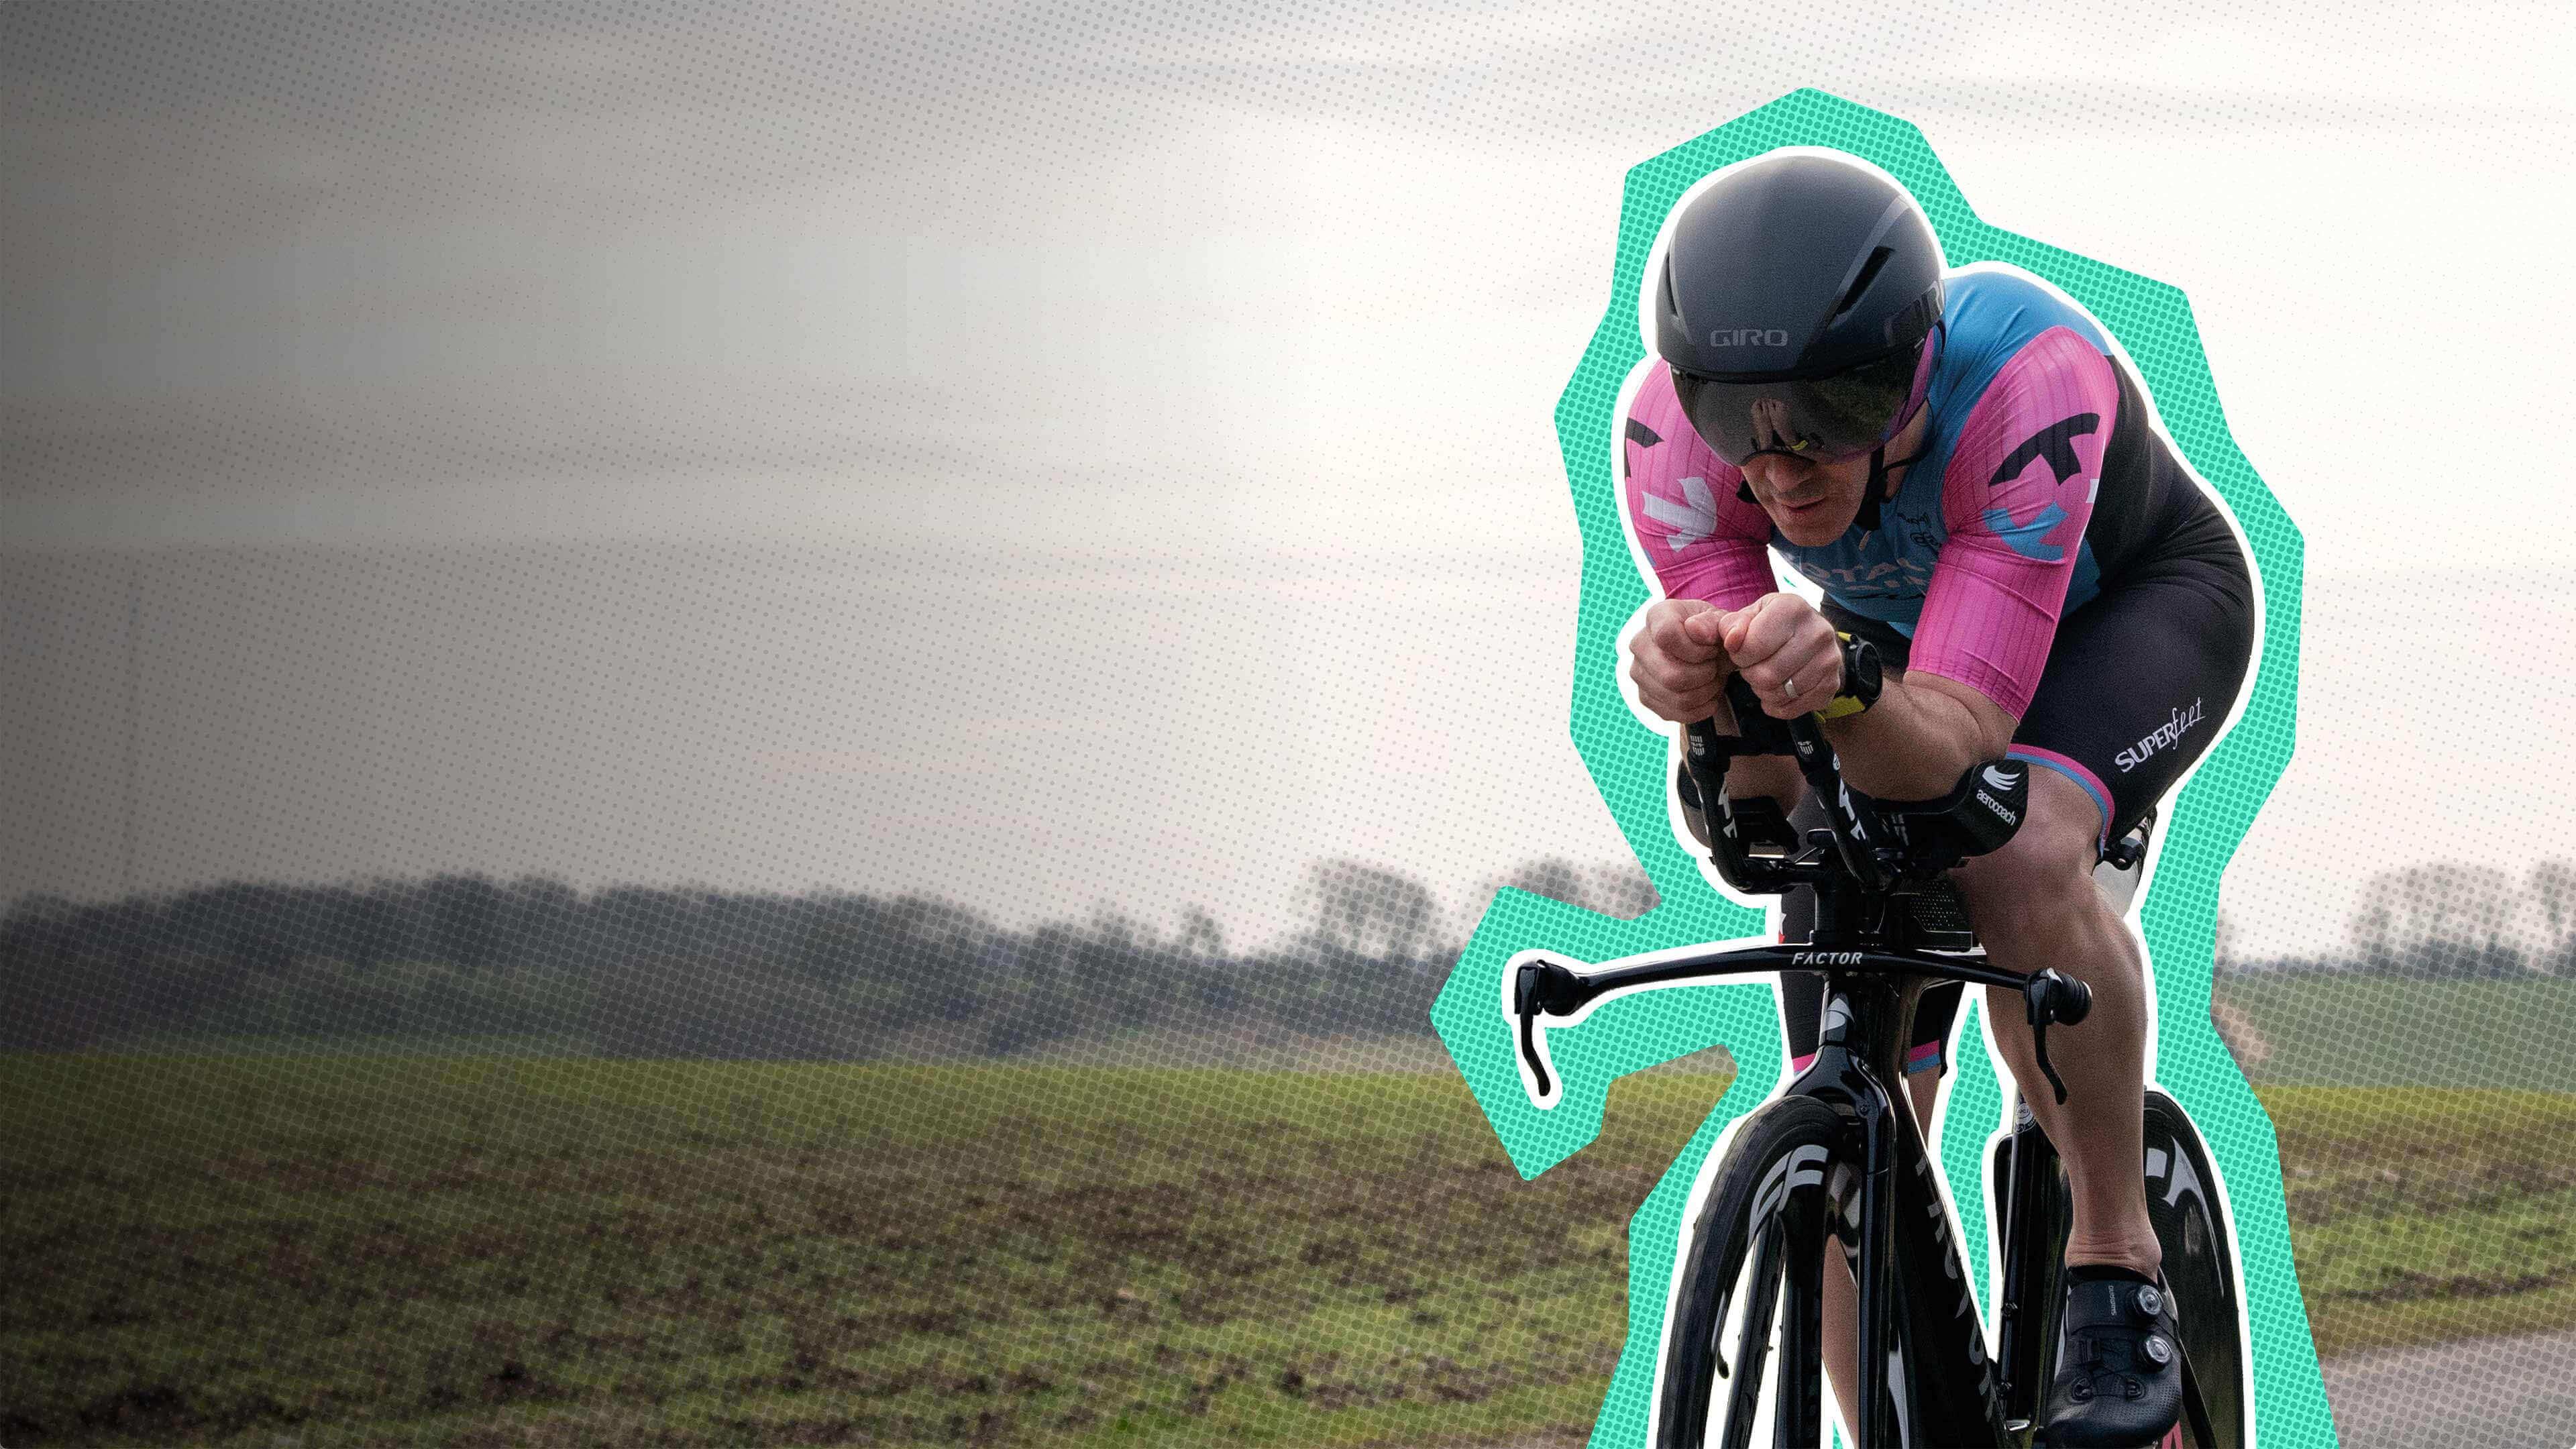 Bikmo Triathlon Rider